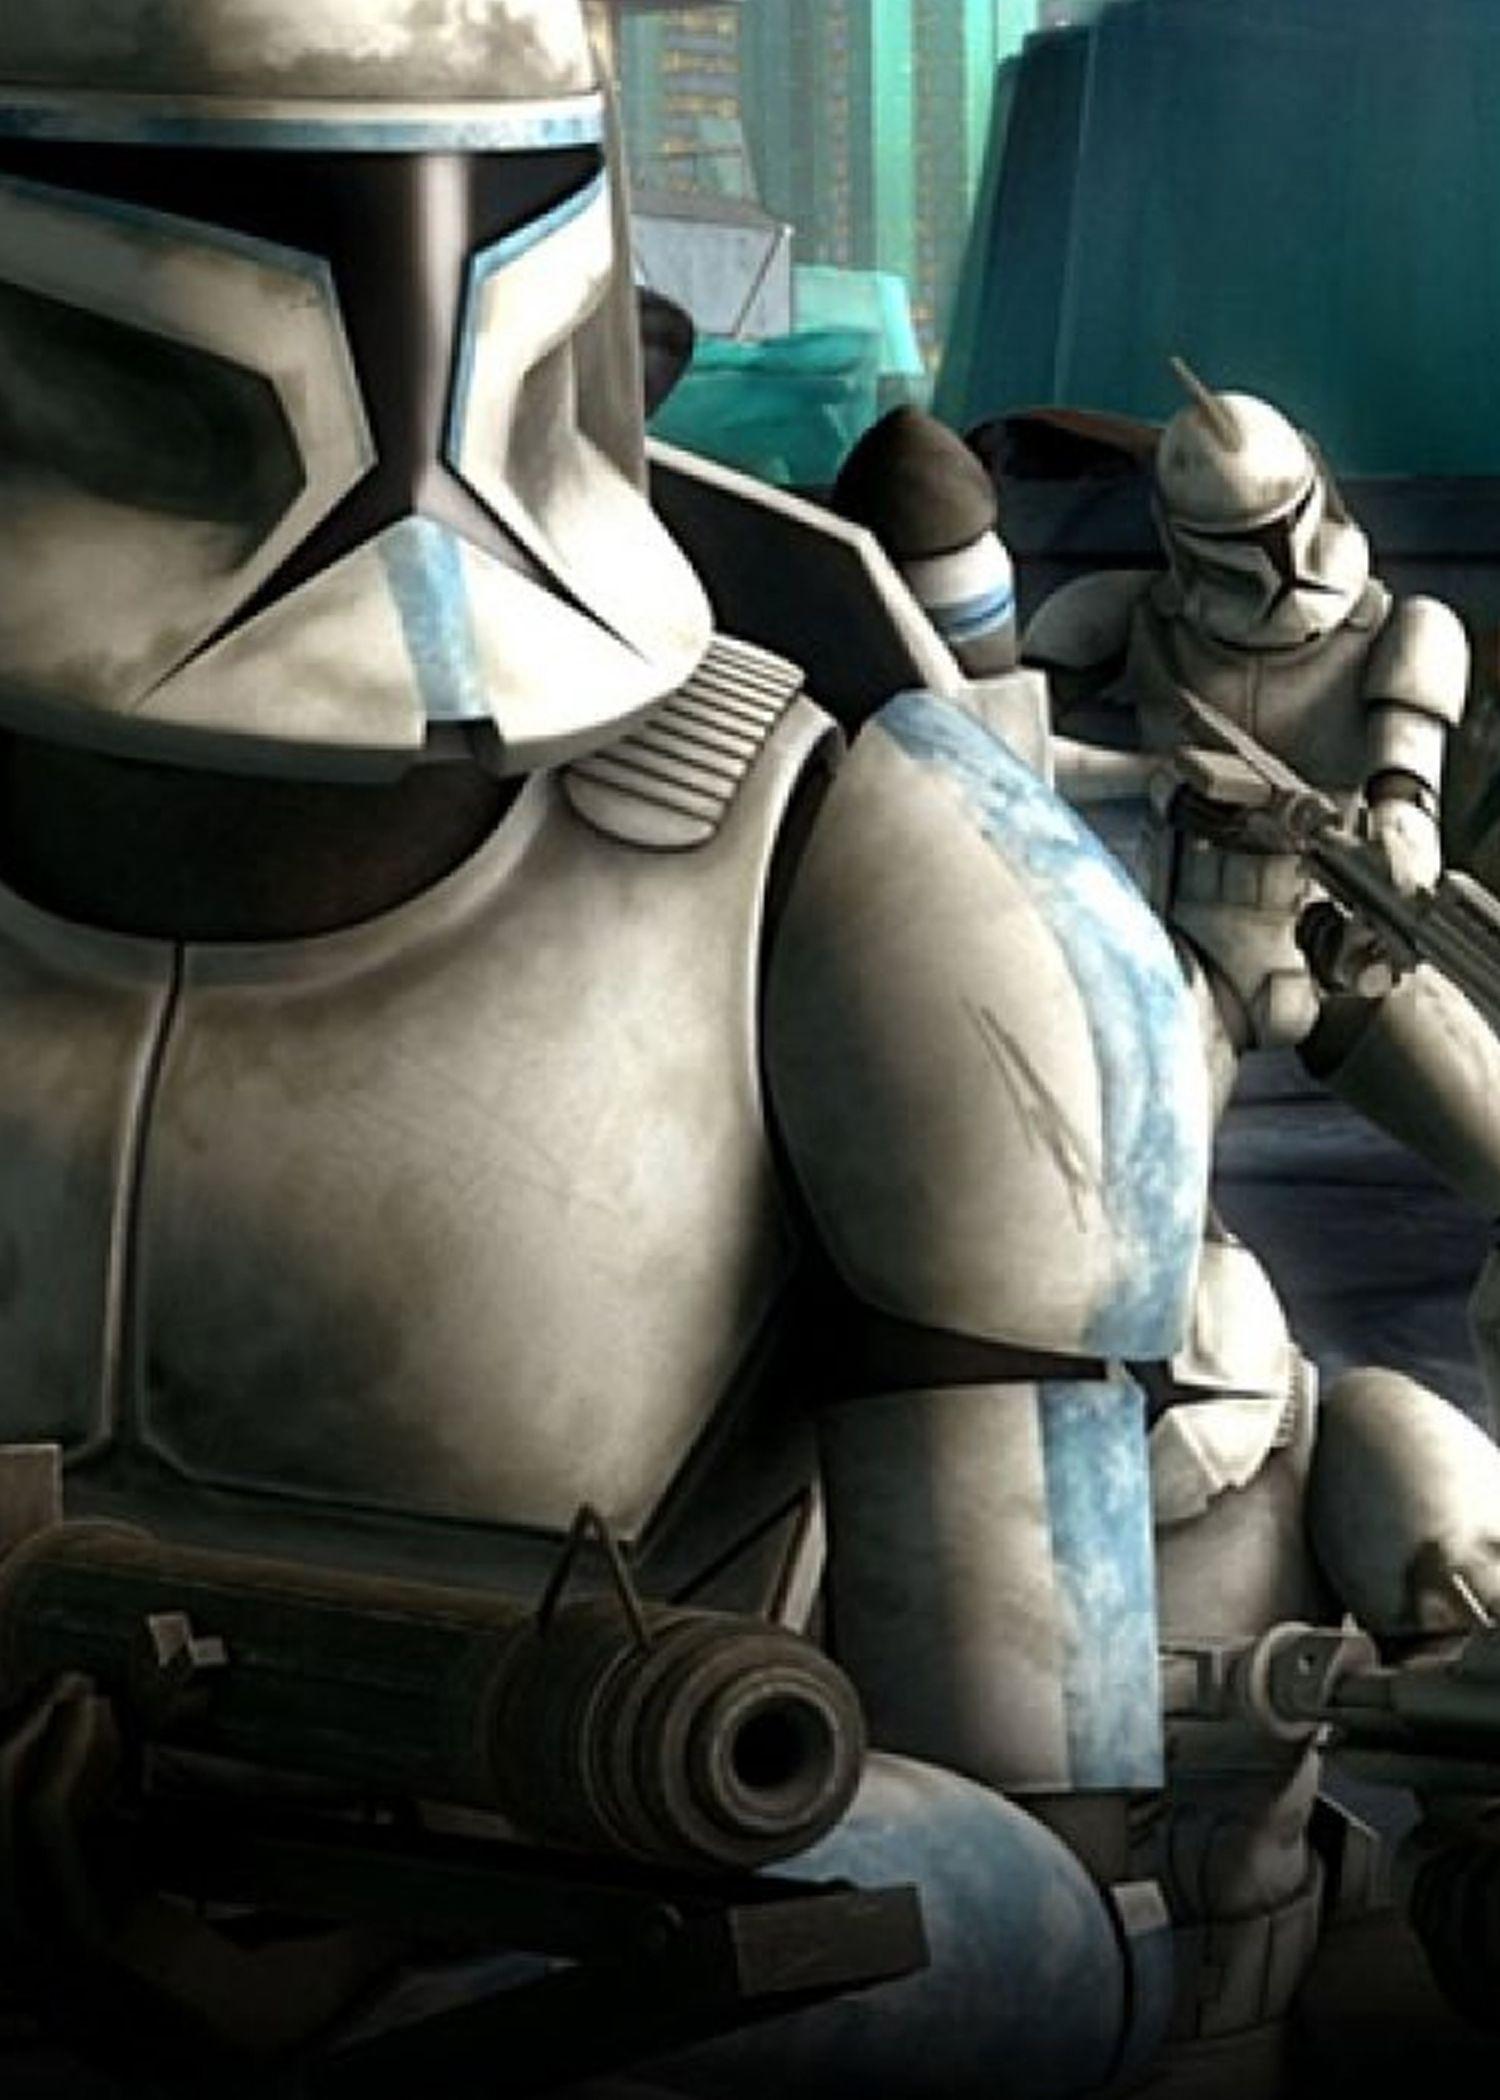 Jangos Boys Star Wars Star Wars Clone Wars Star Wars Rpg